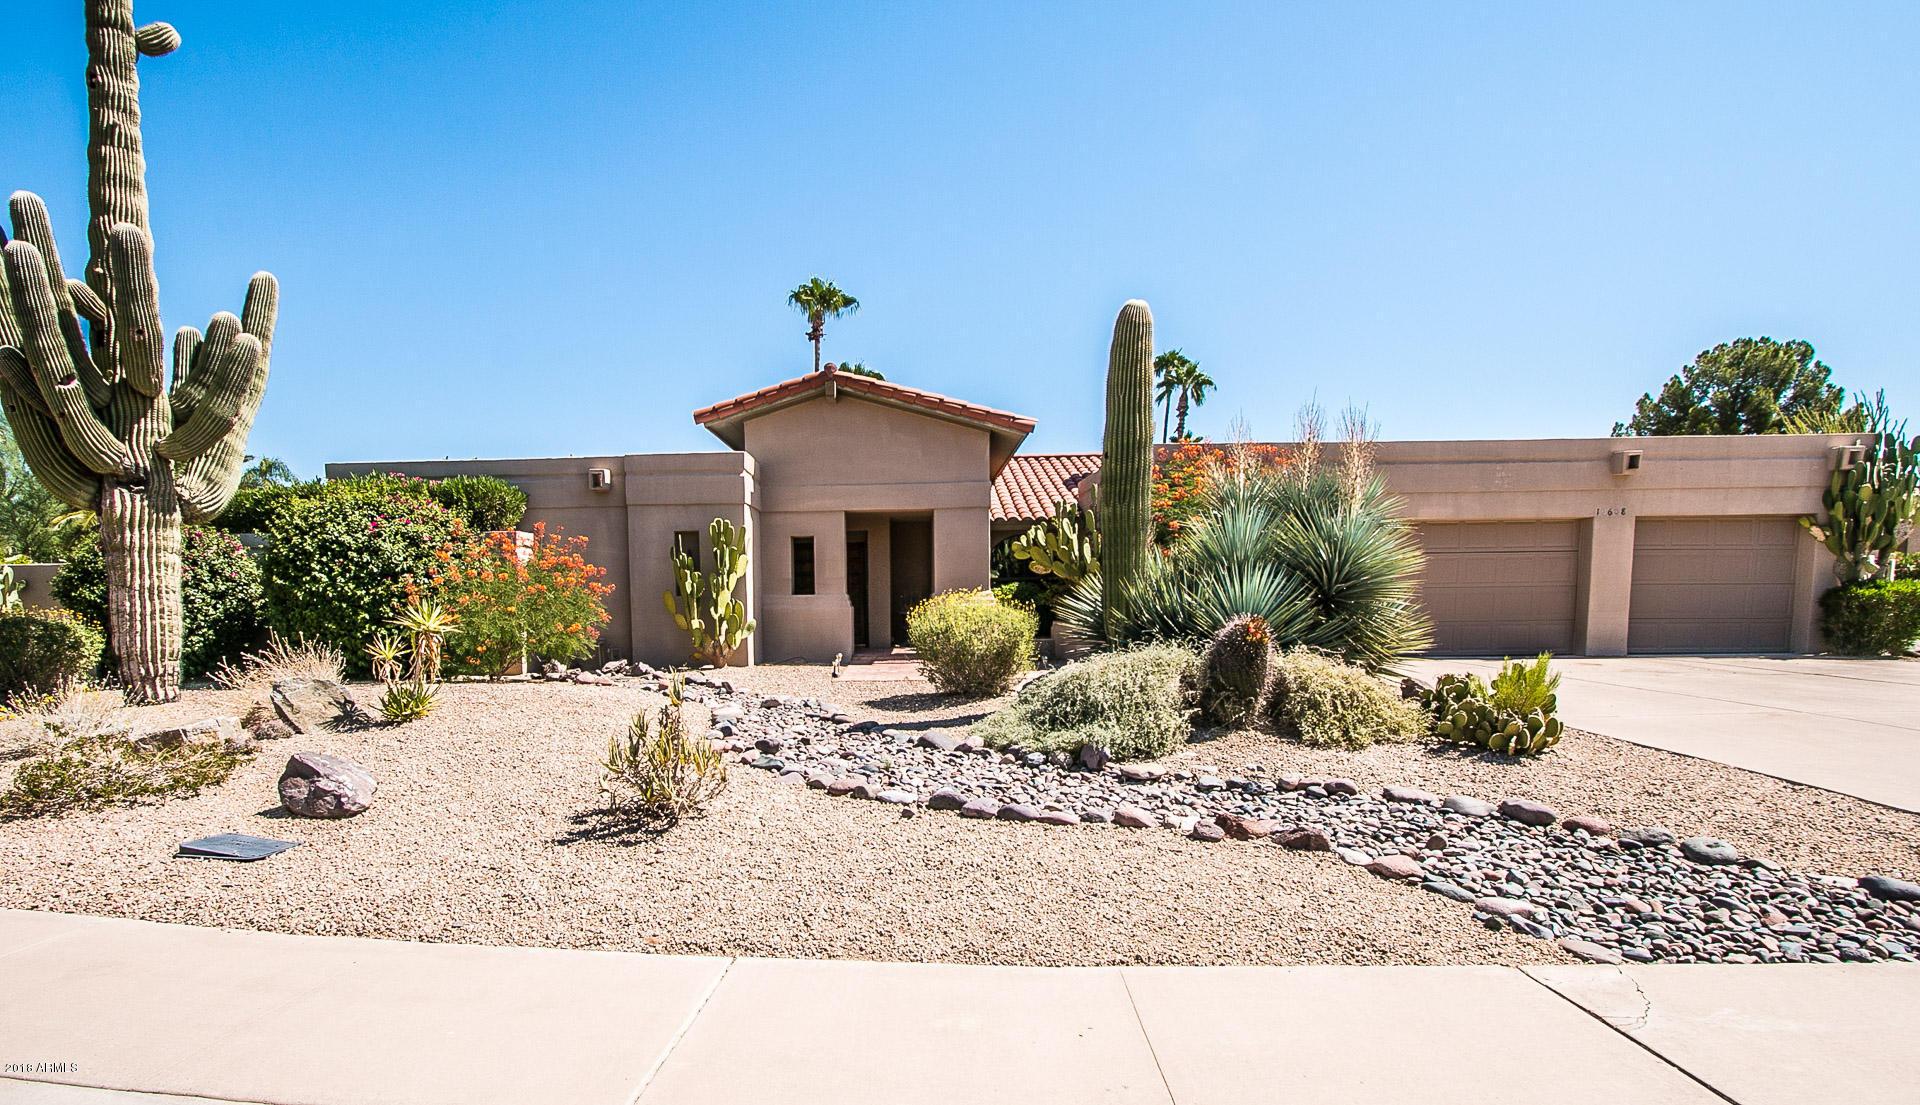 10608 E ARABIAN PARK Drive, Scottsdale, AZ 85258, 4 Bedrooms Bedrooms, ,Residential Lease,For Rent,10608 E ARABIAN PARK Drive,6270475